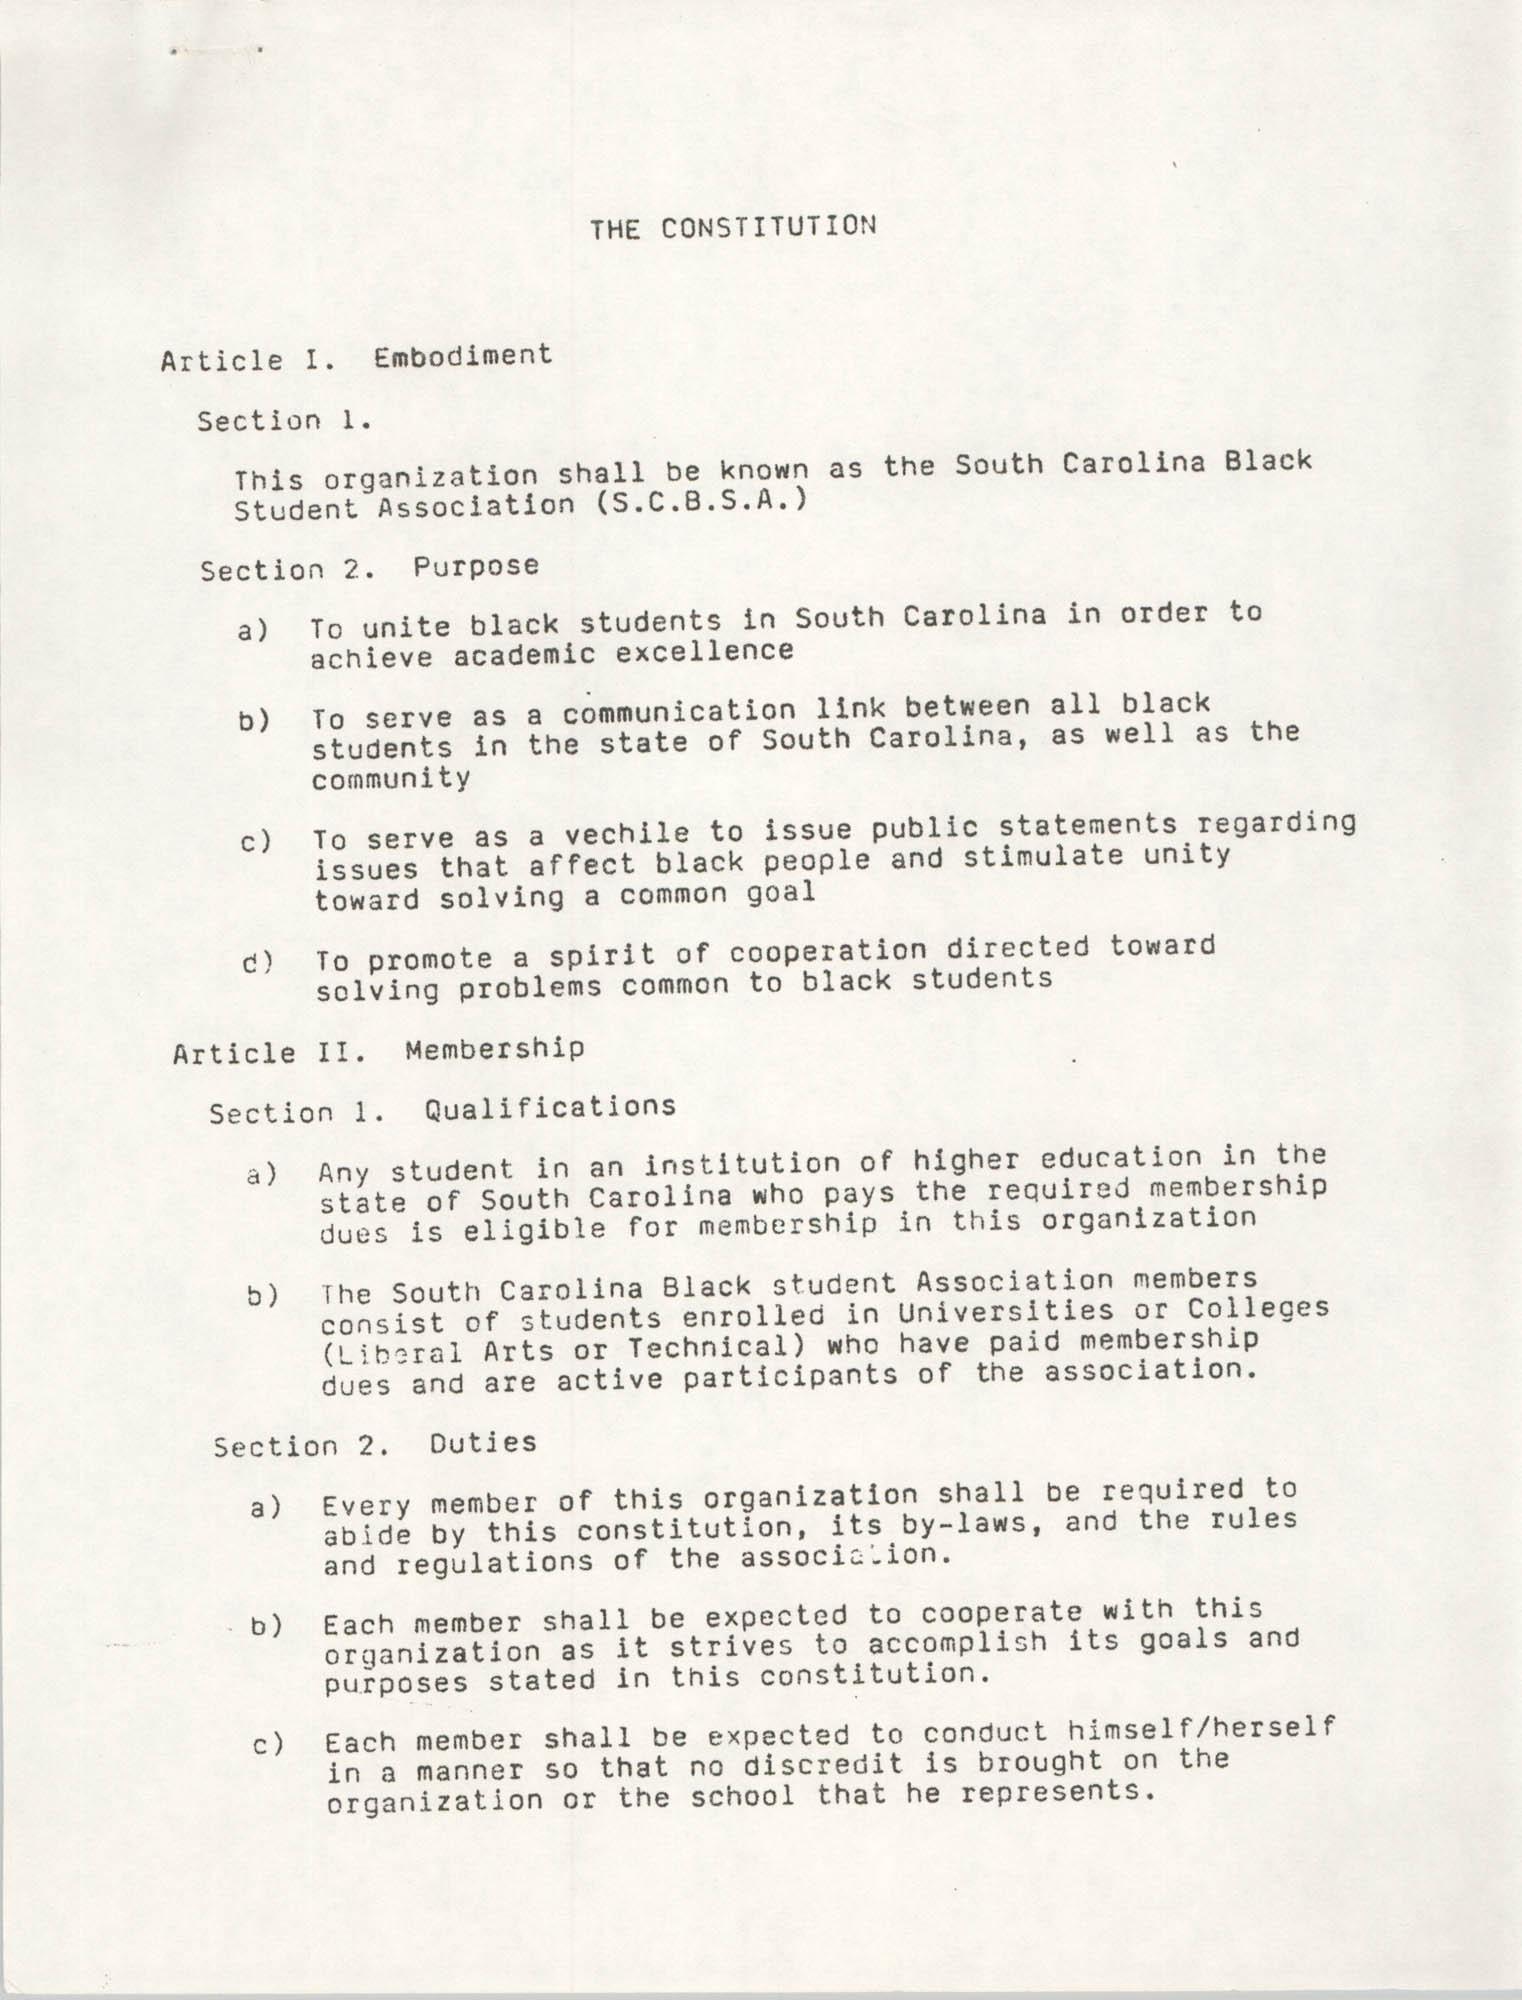 South Carolina Black Student Association Constitution